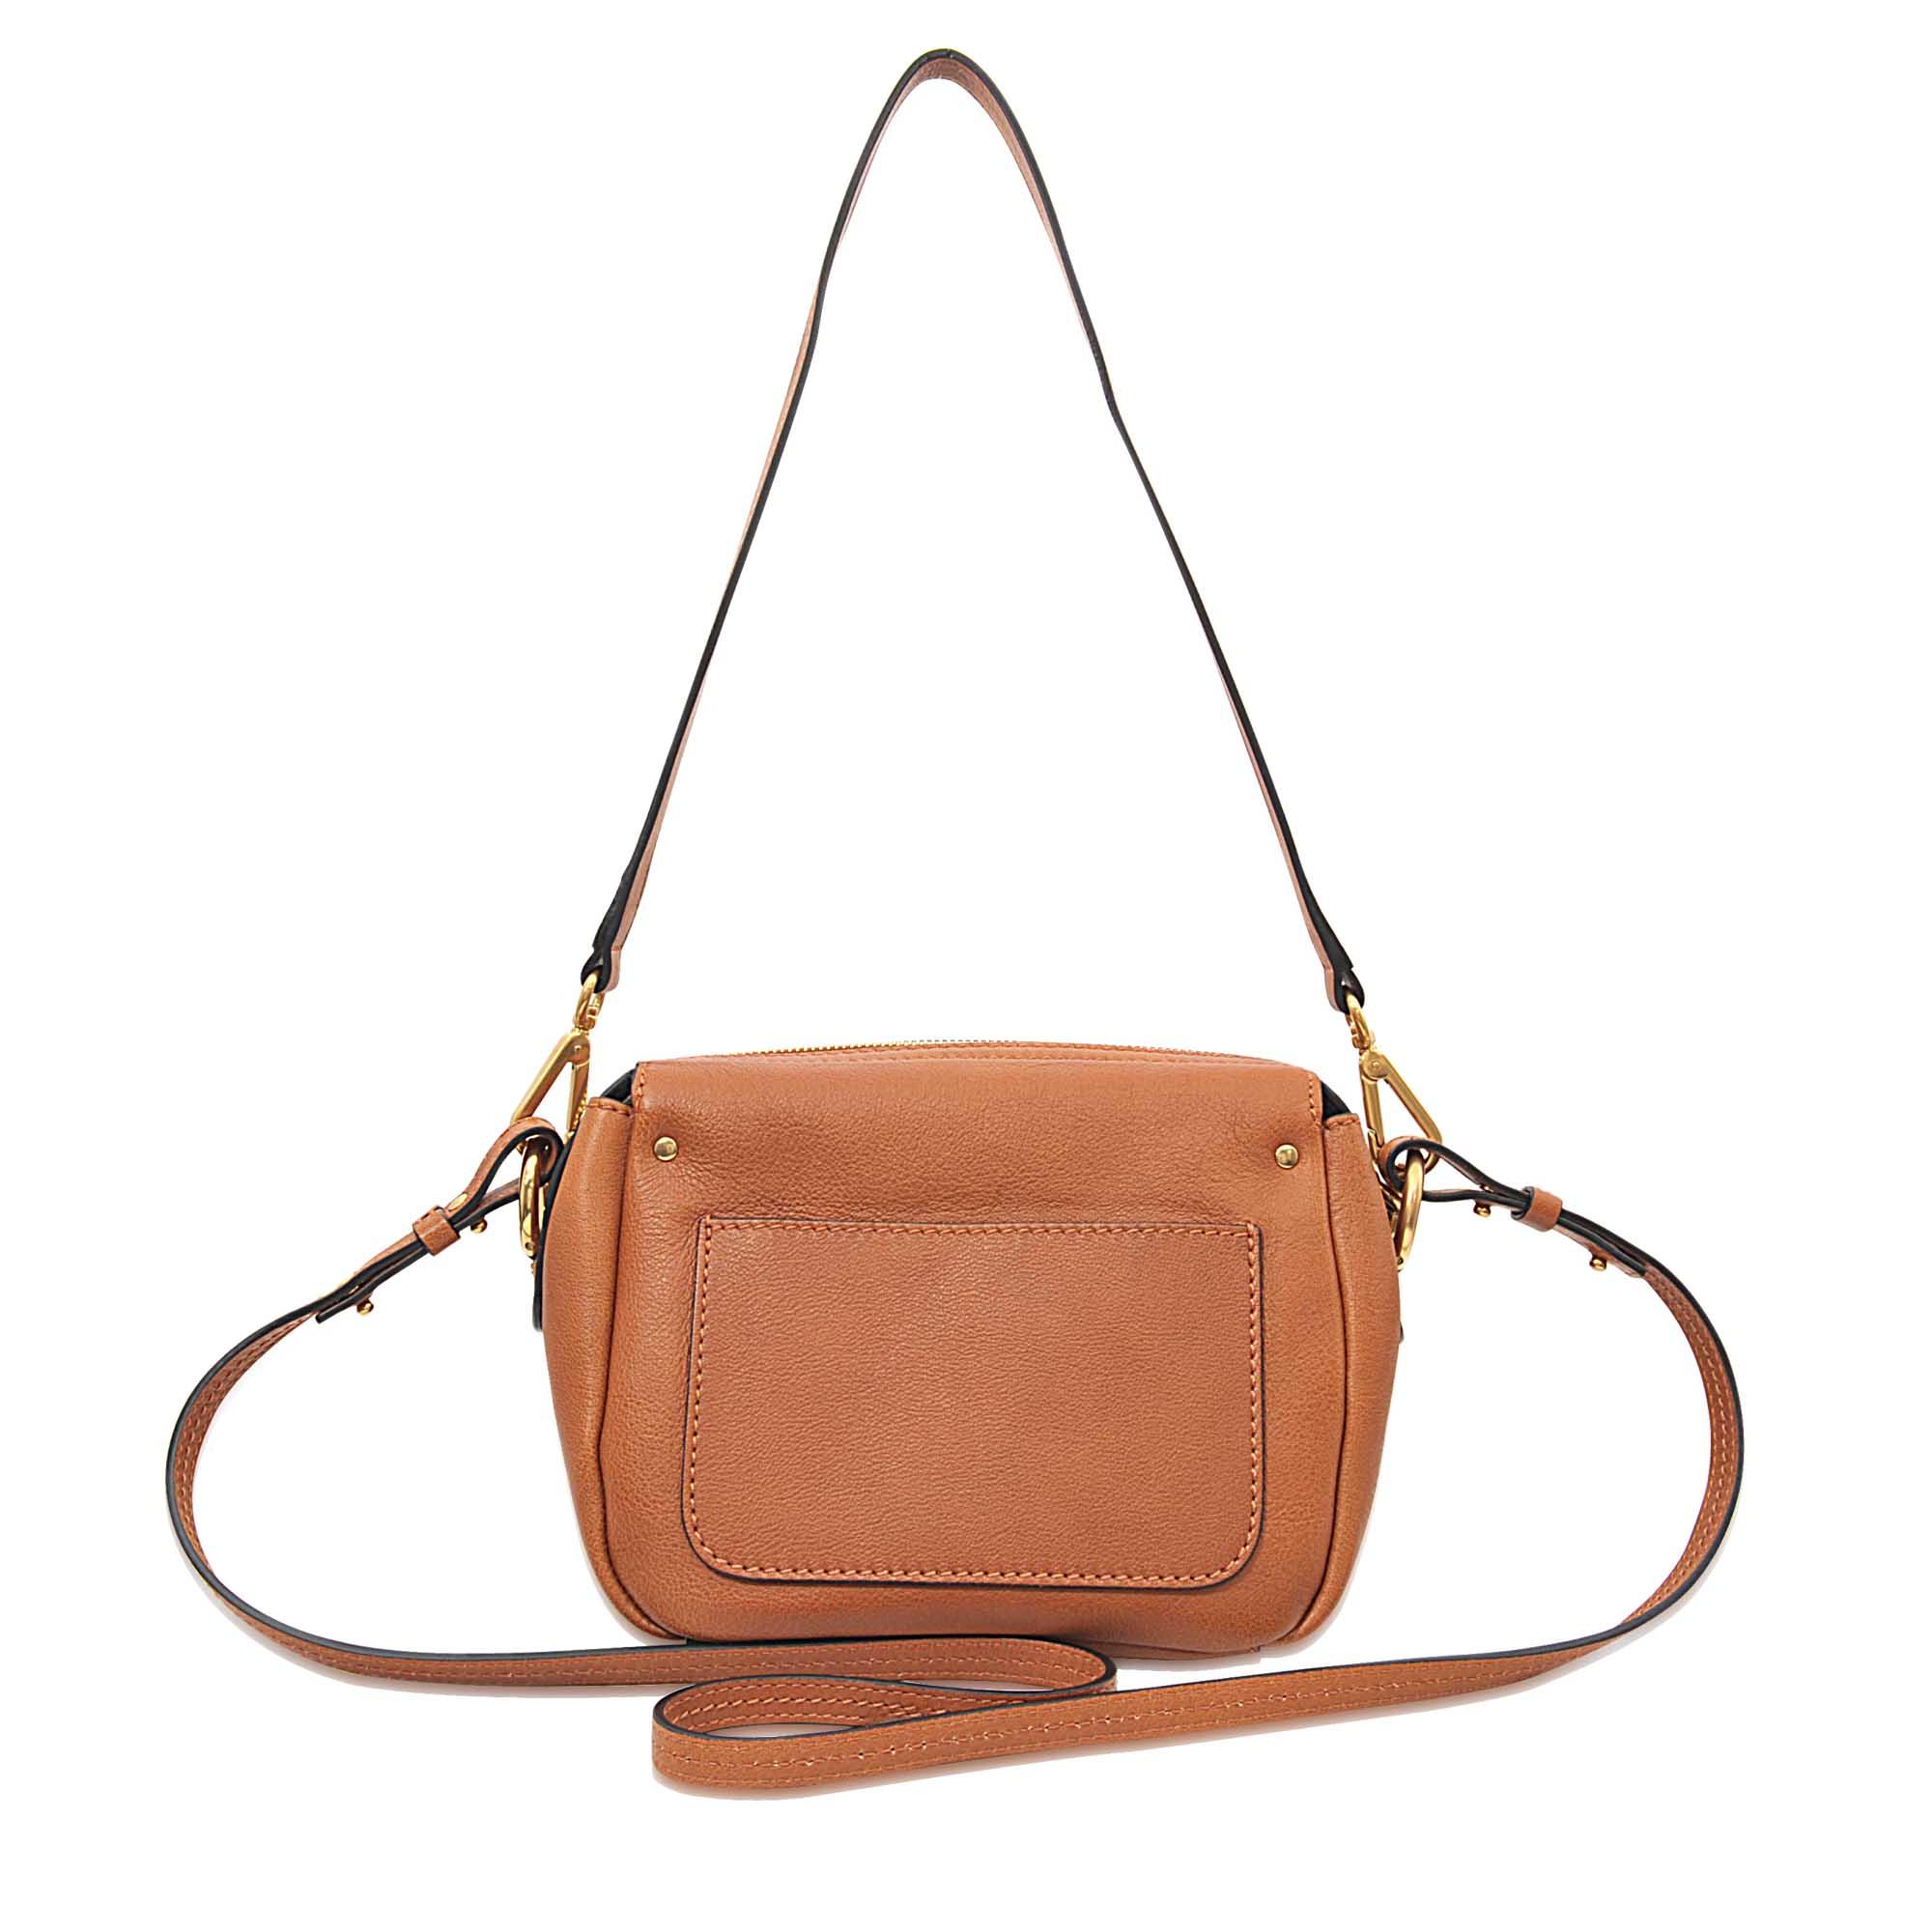 cloe handbag - jodie camera bag in grained calfskin